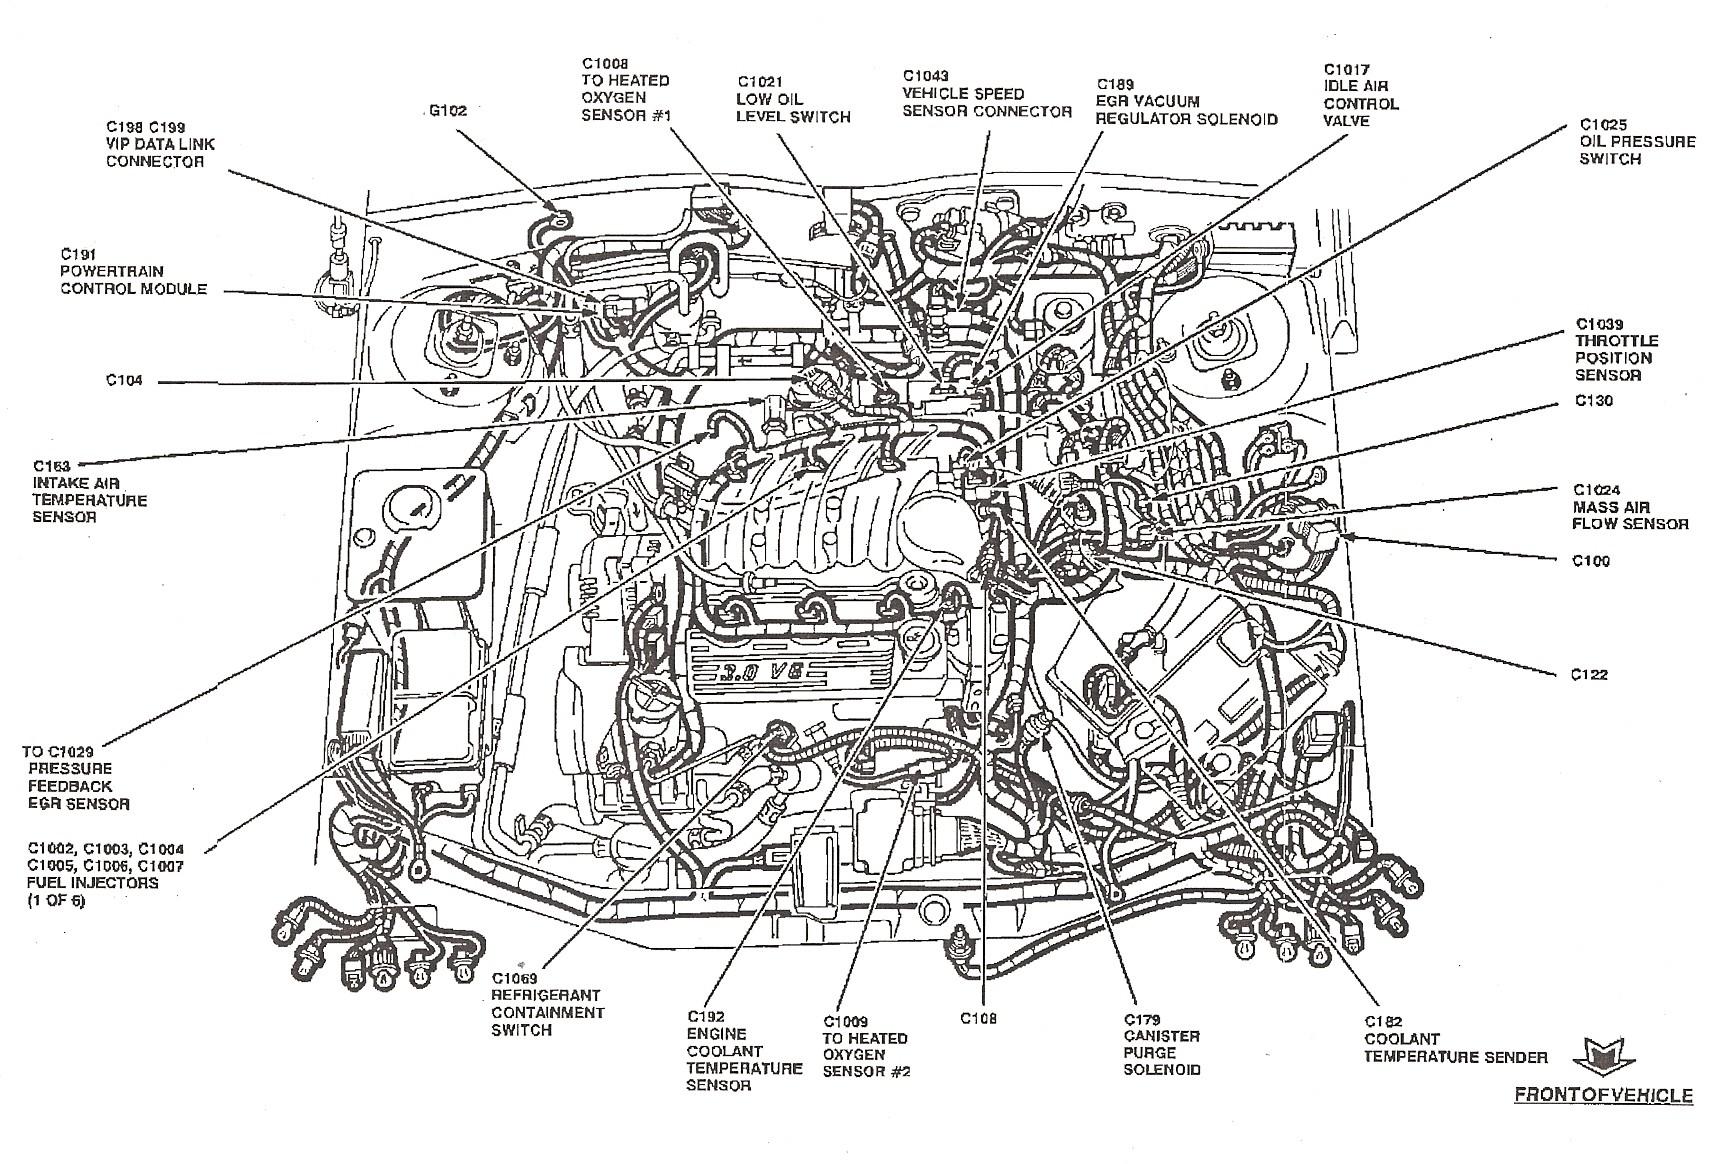 hight resolution of 2001 vw jetta 2 0 engine diagram zetec engine diagram